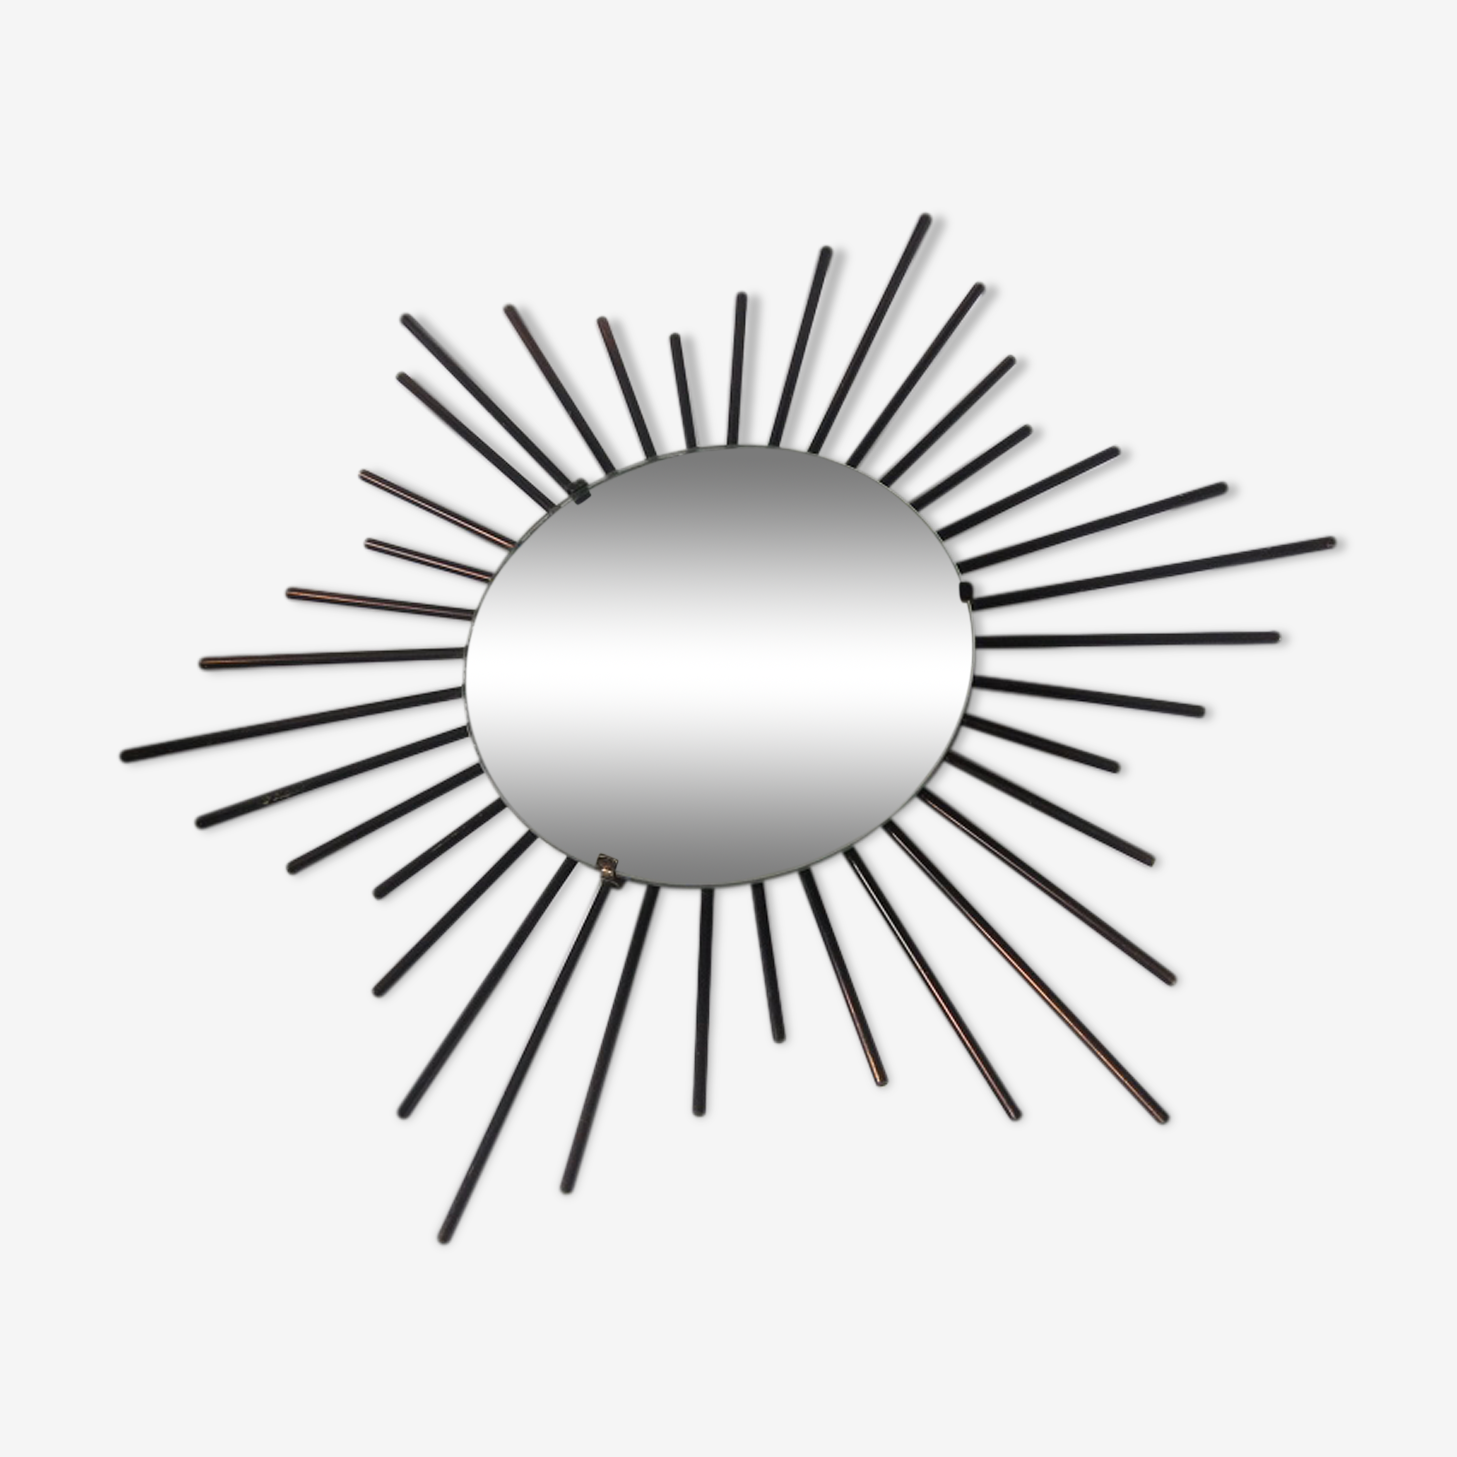 Miroir soleil en métal noir 60 x 60 cm